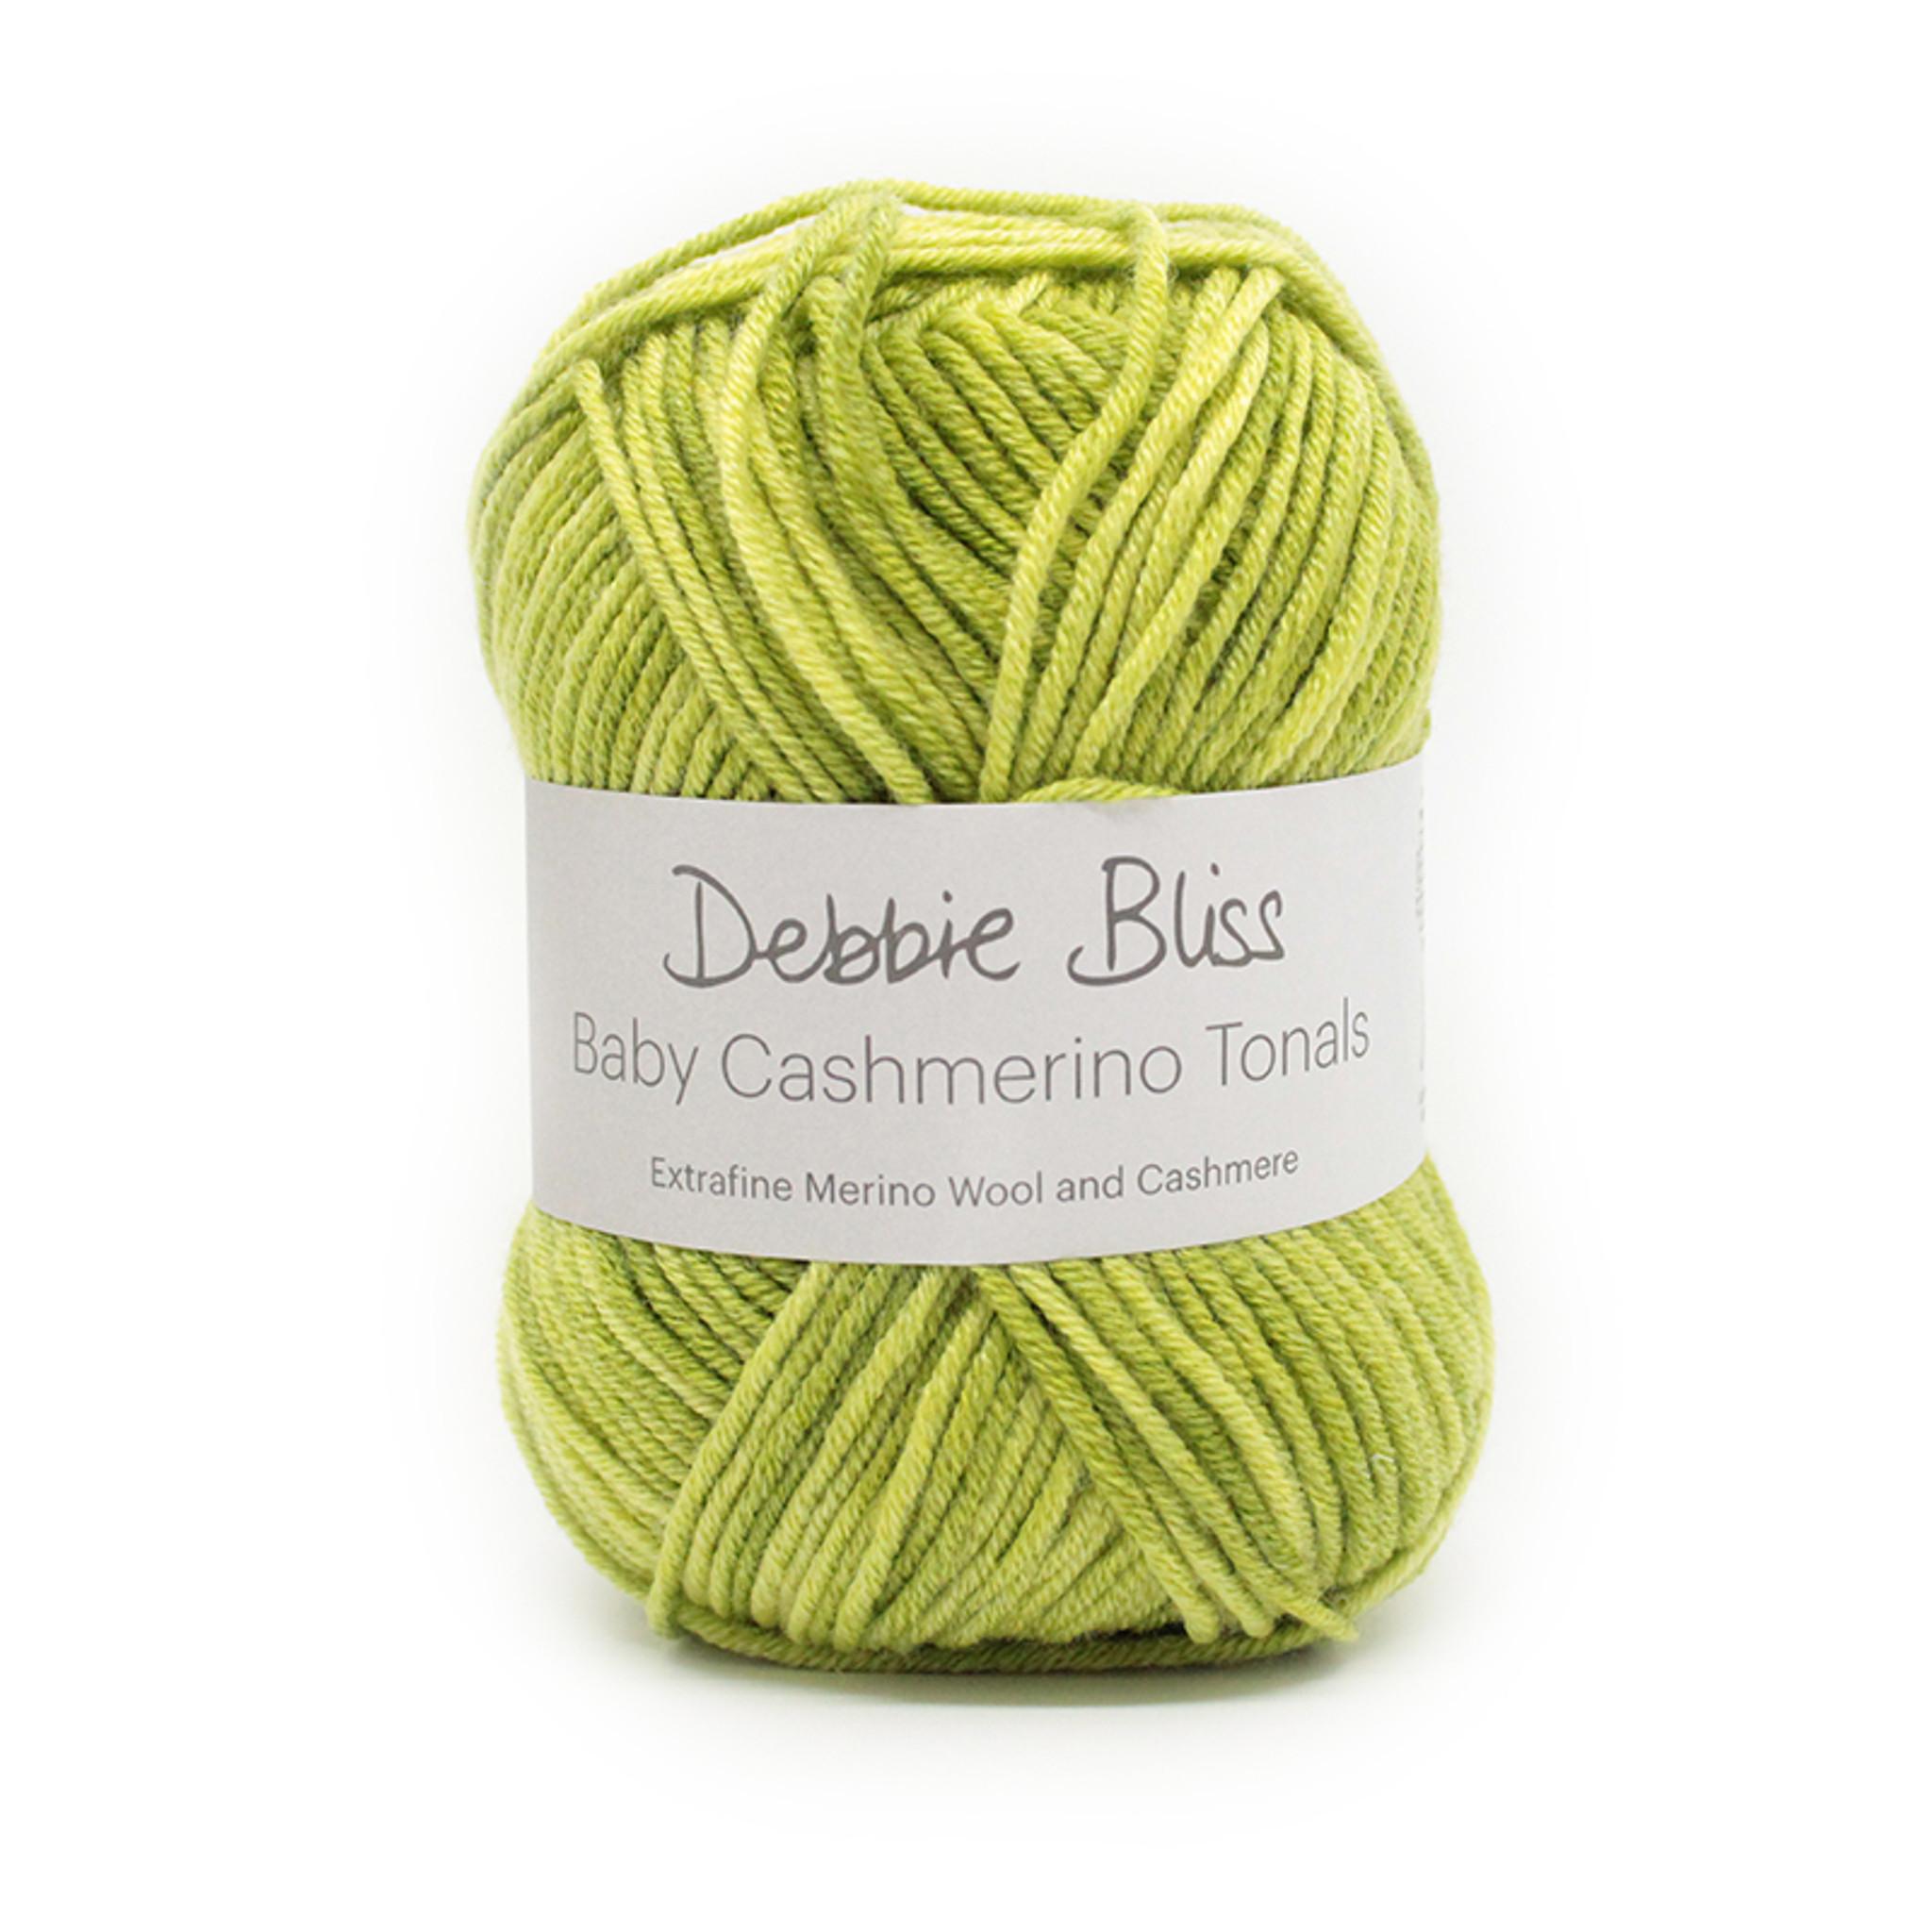 Debbie Bliss Cashmerino Aran Tonals Yellow Wool /& Cashmere 5 x 50g